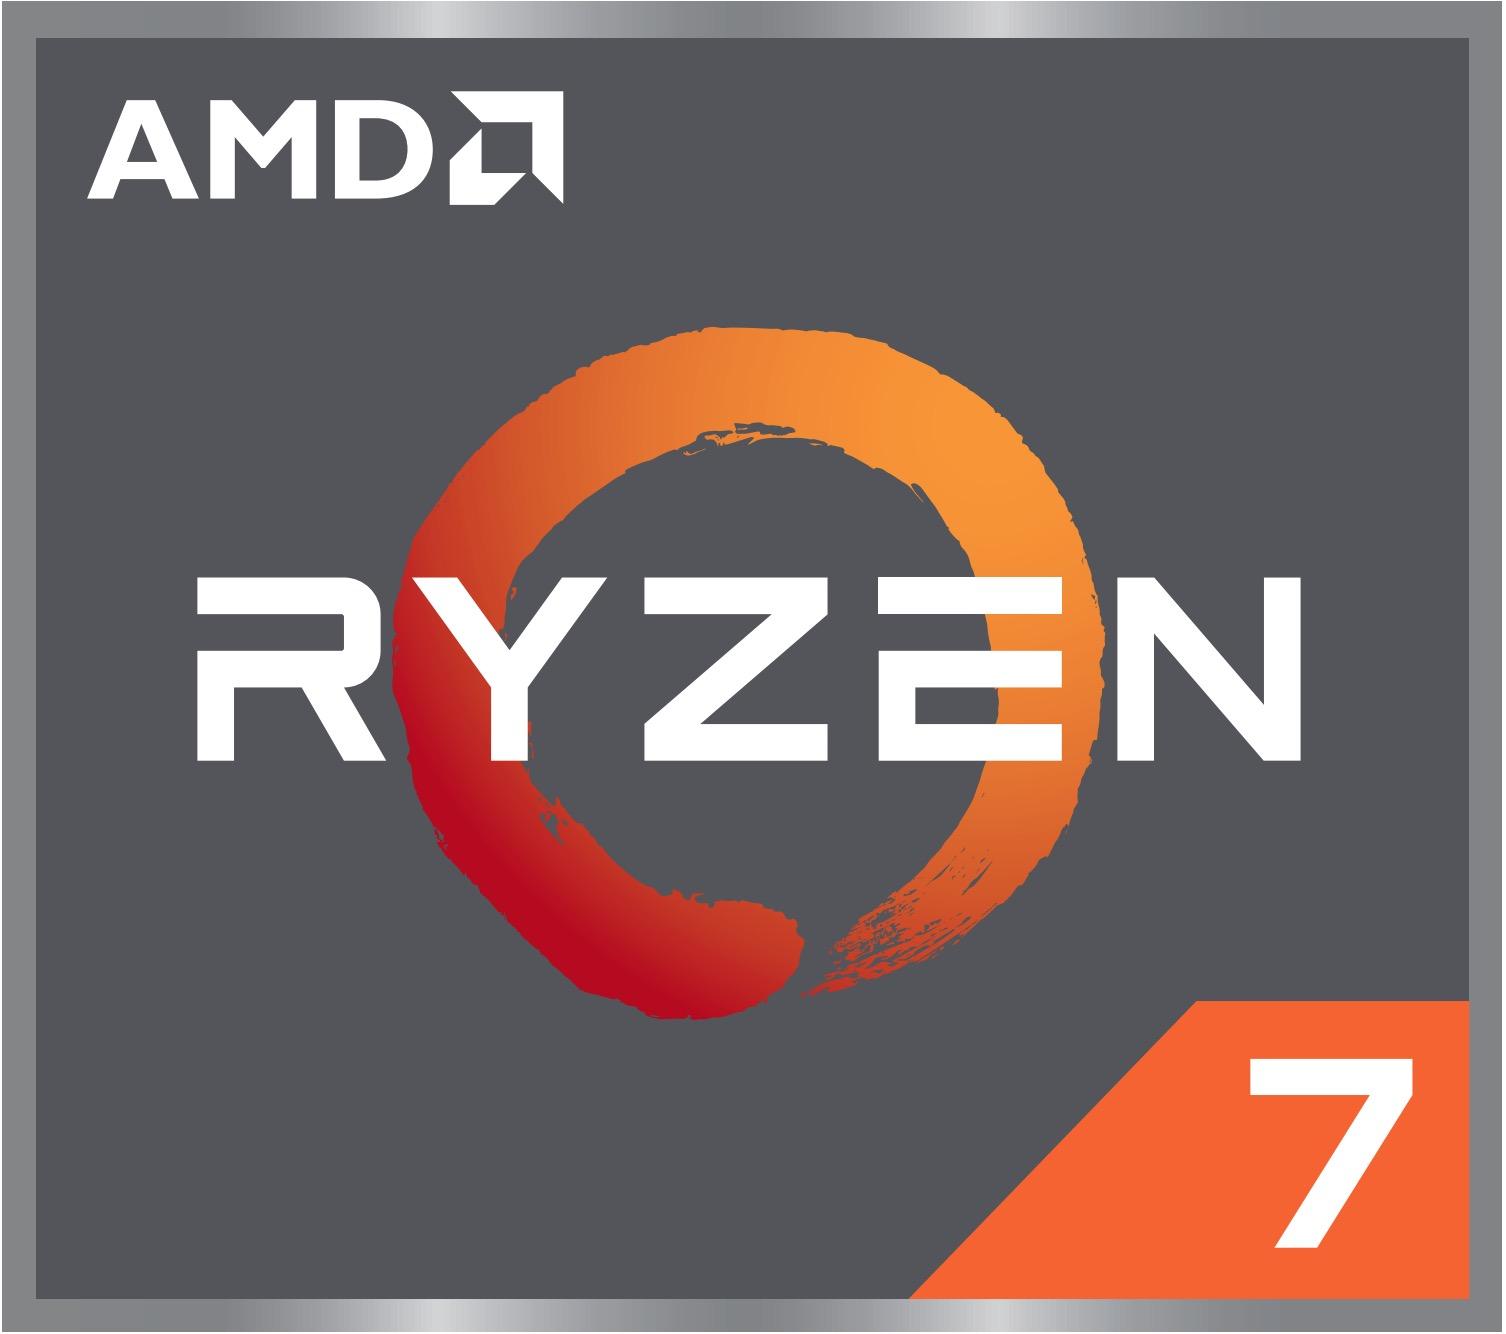 Amd Ryzen 7 3780u Soc Benchmarks And Specs Notebookcheck Net Tech